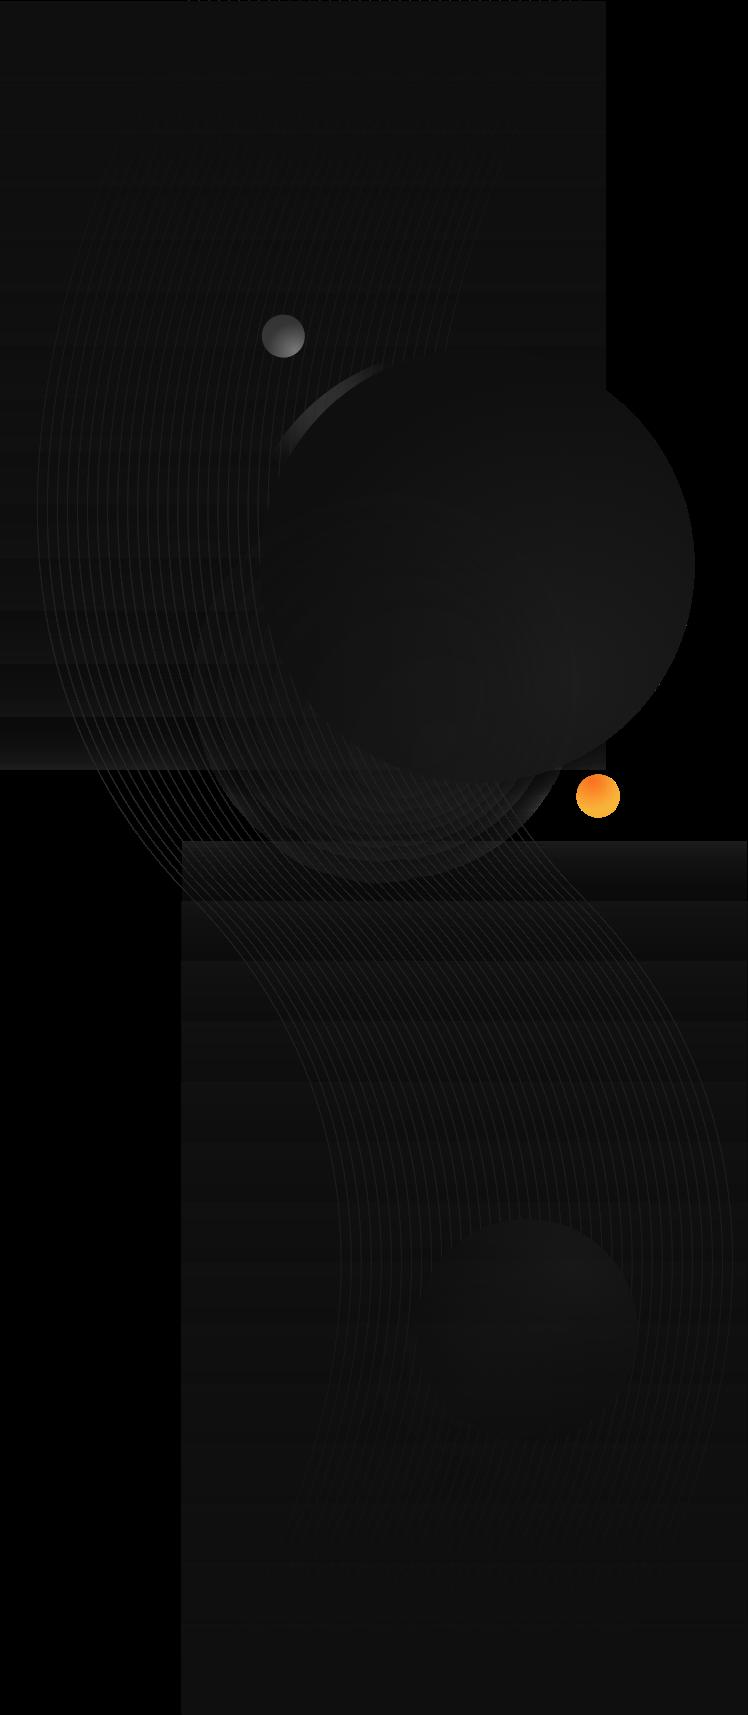 demo-attachment-595-shape_about_us